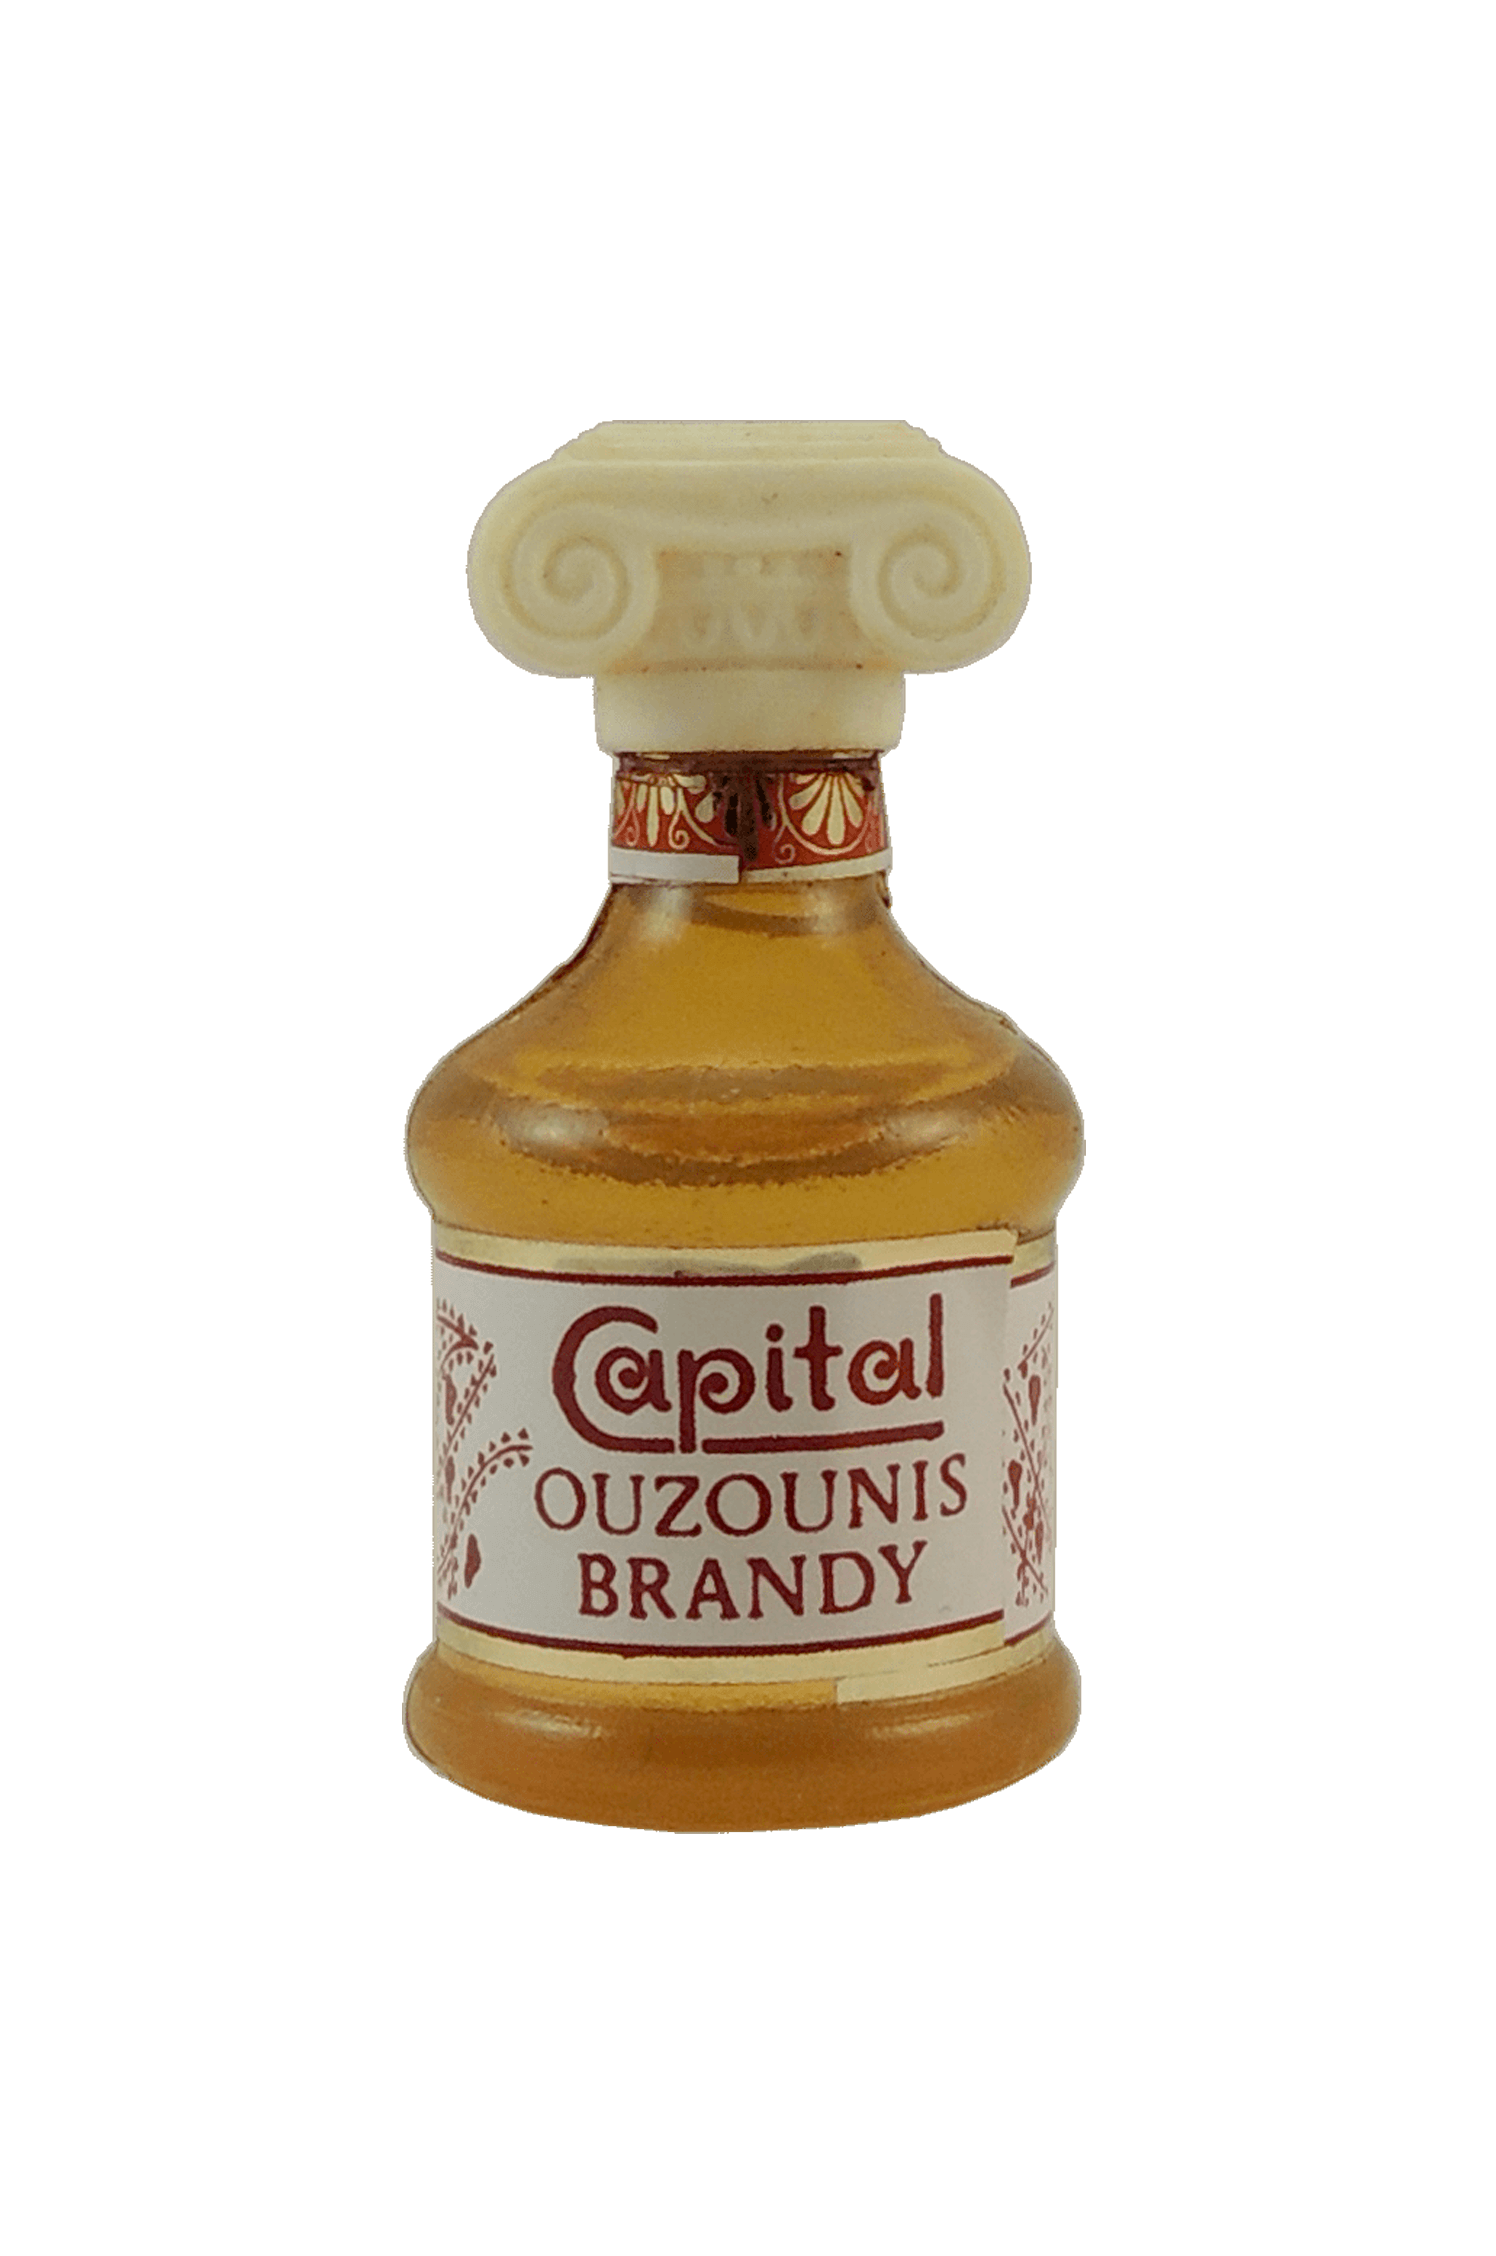 Capital Ouzounis Brandy